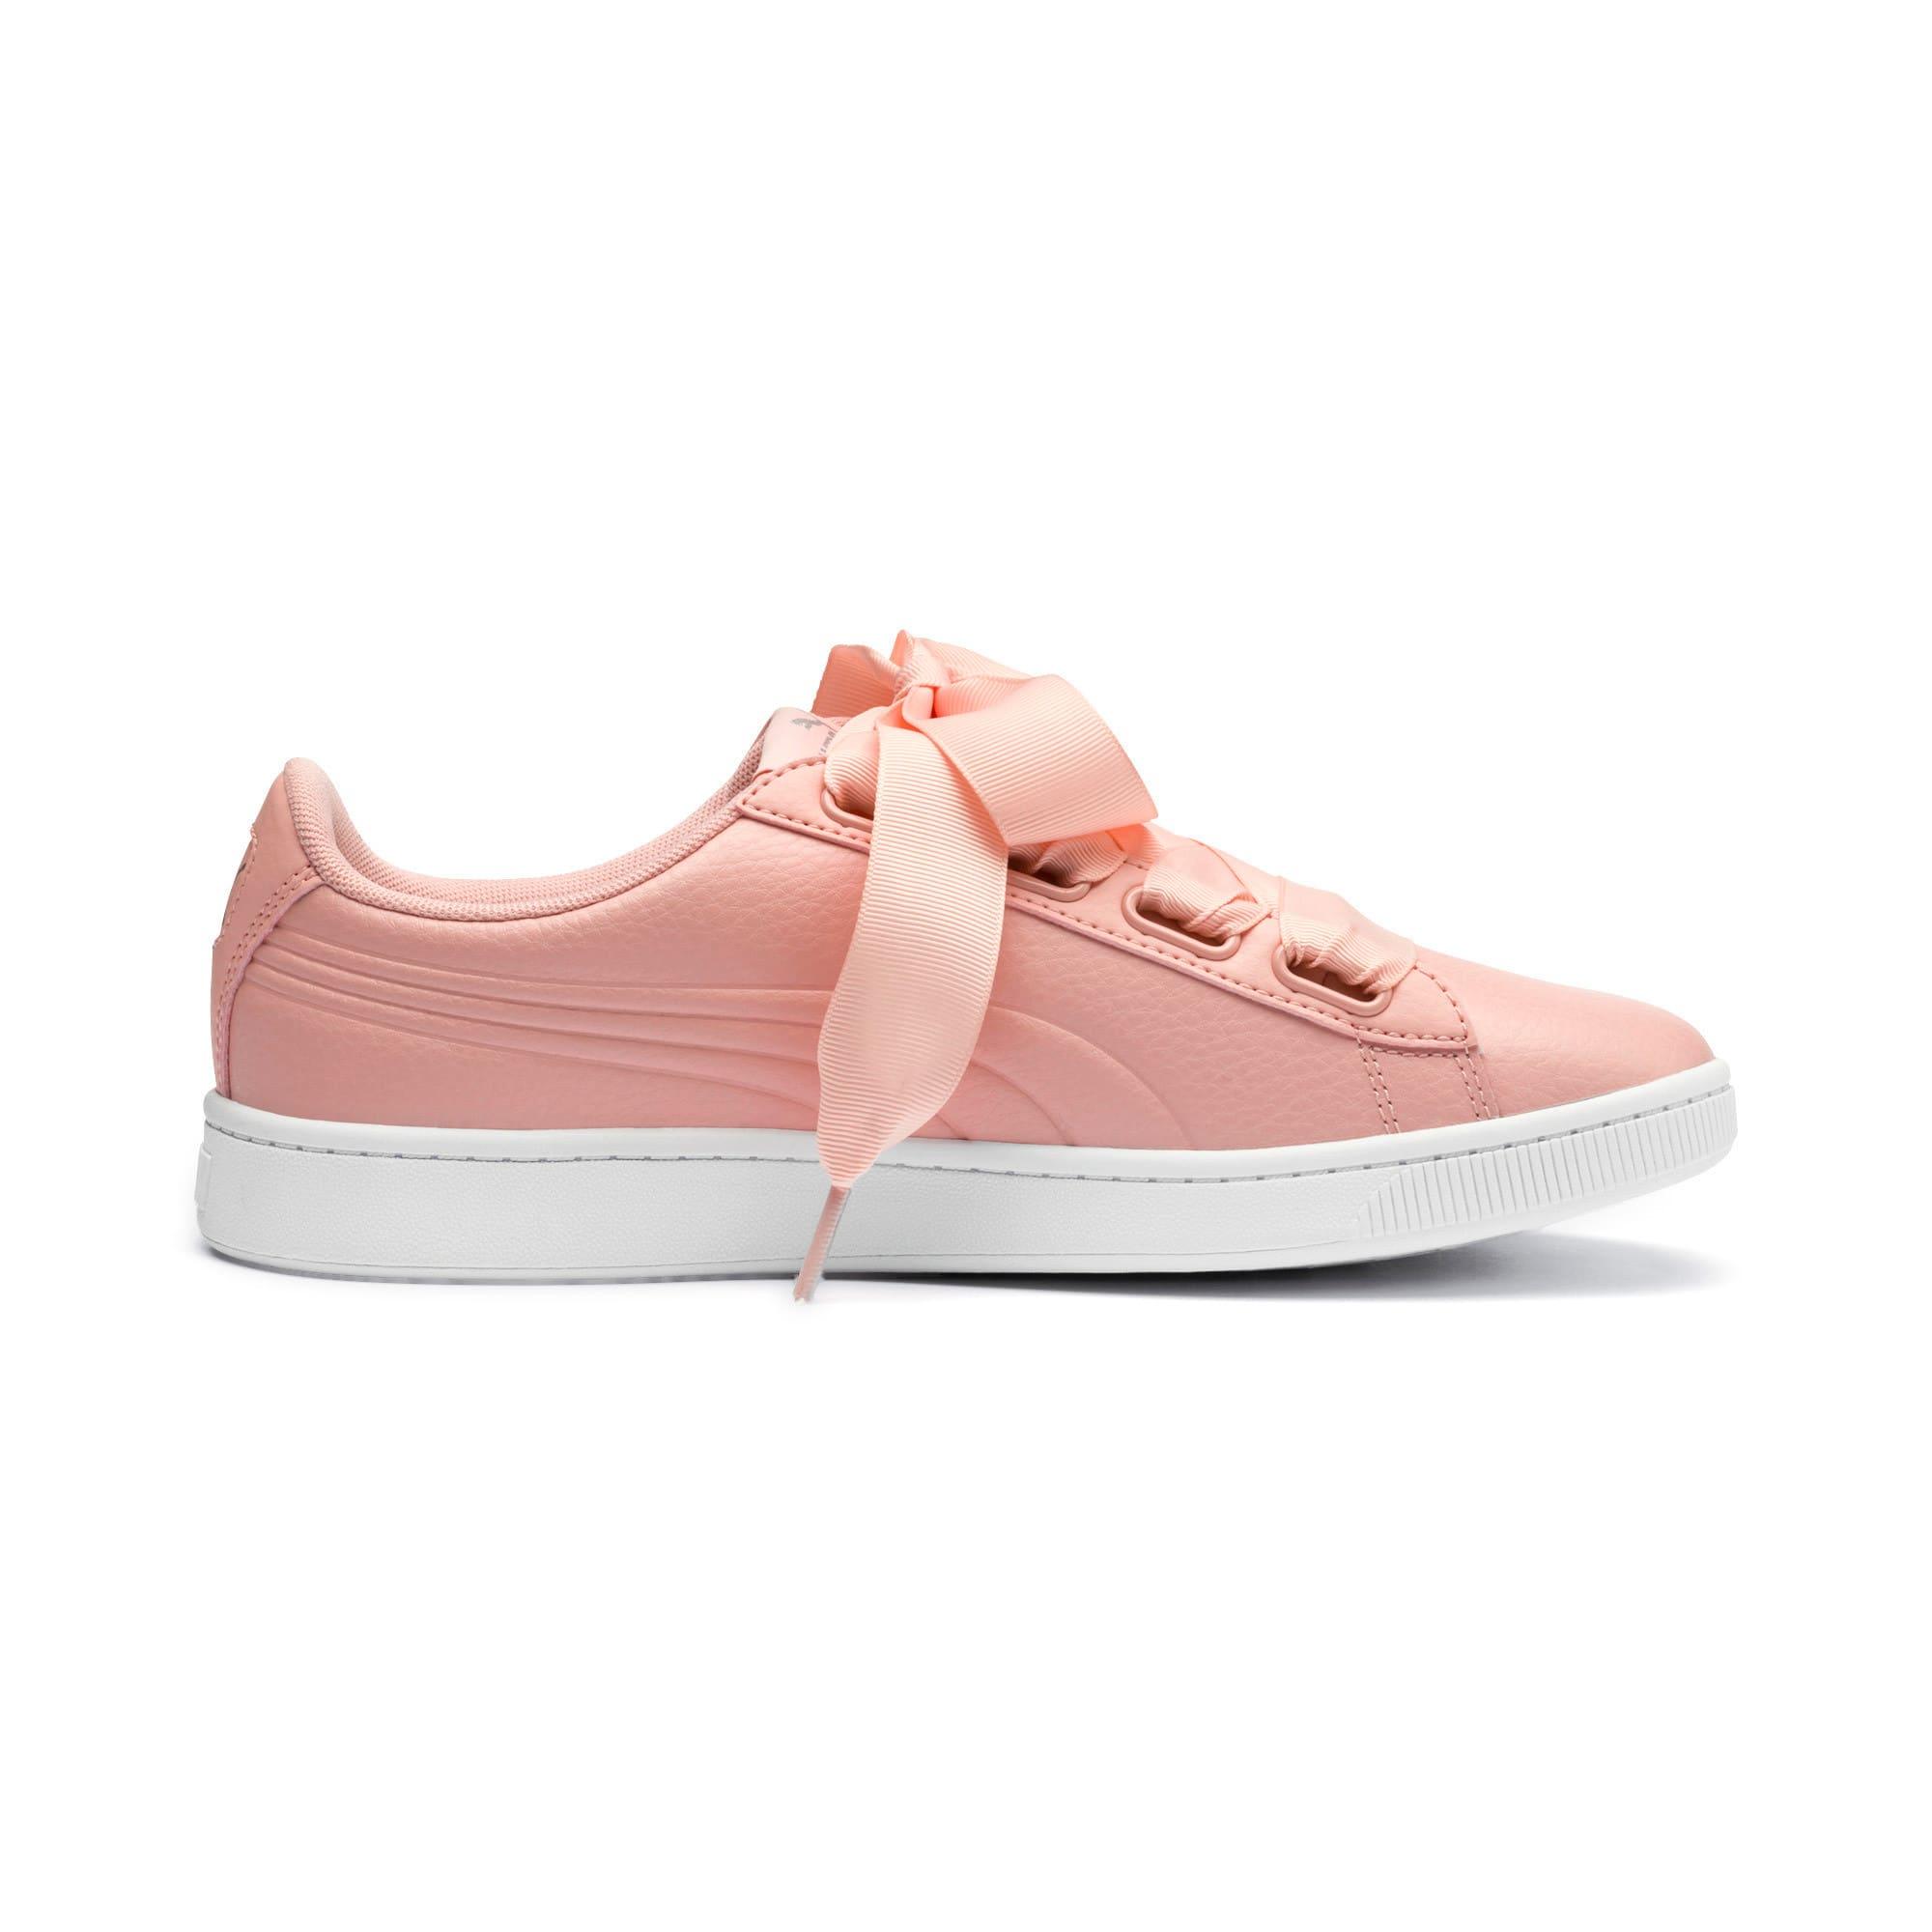 Thumbnail 5 of Vikky v2 Ribbon Core Damen Sneaker, Peach Bud-Puma Silver-White, medium